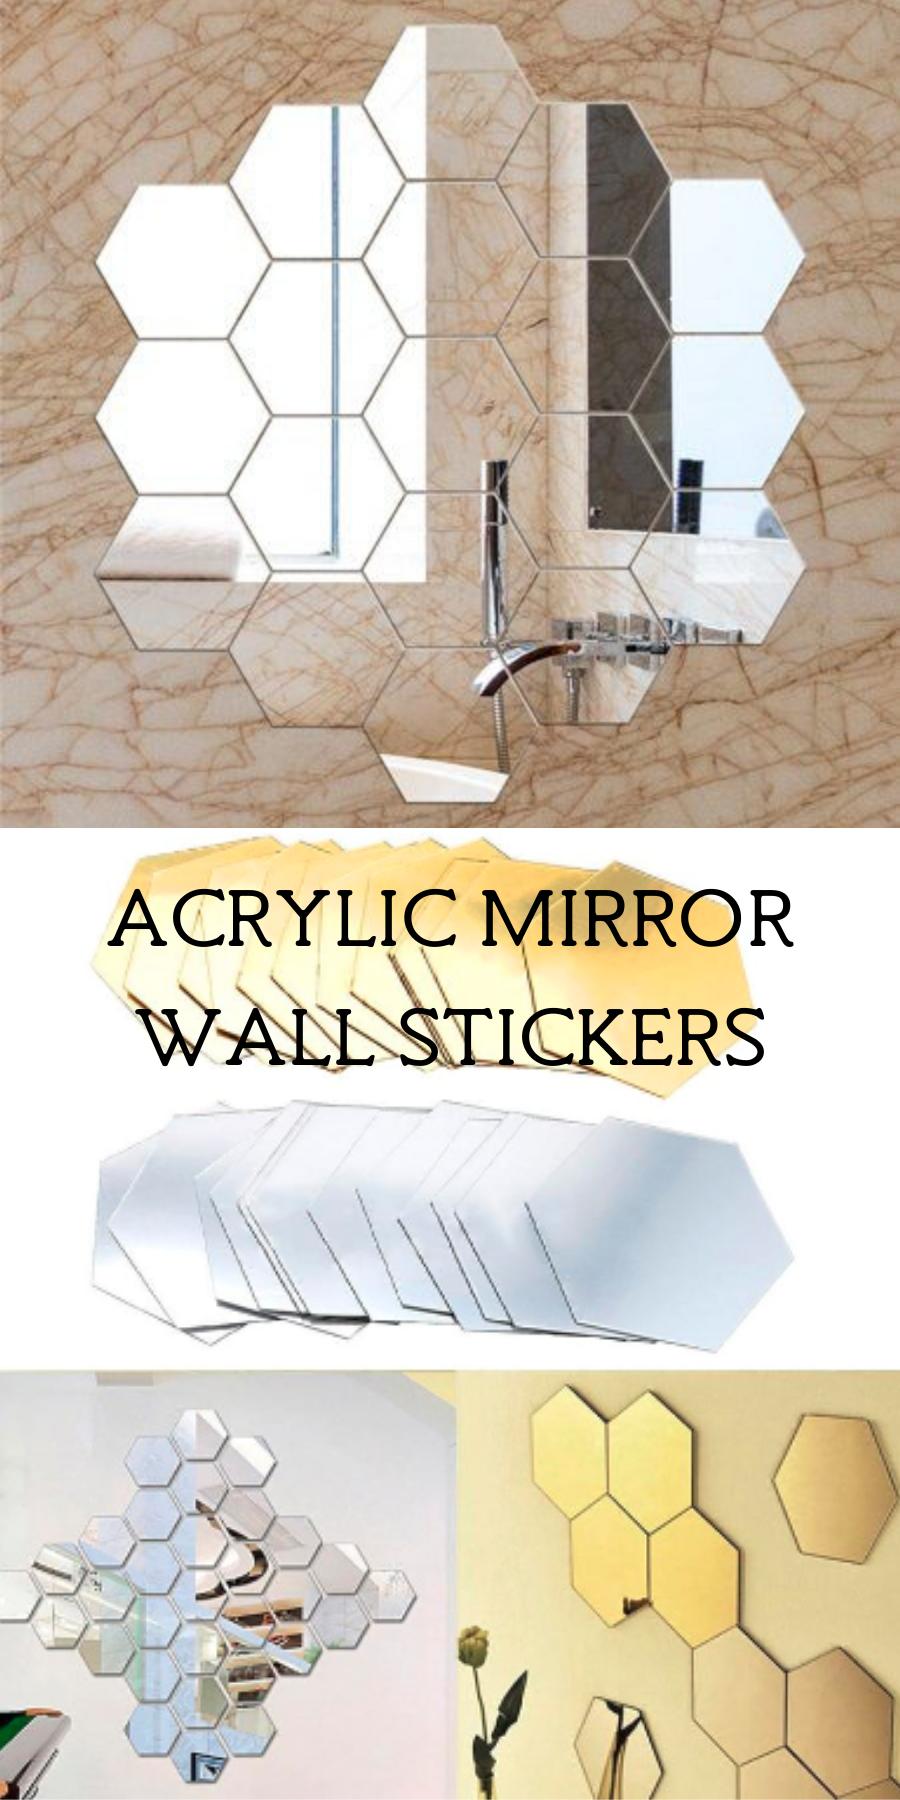 Photo of Acrylic mirror wall stickers Acrylic mirror Home decor idea